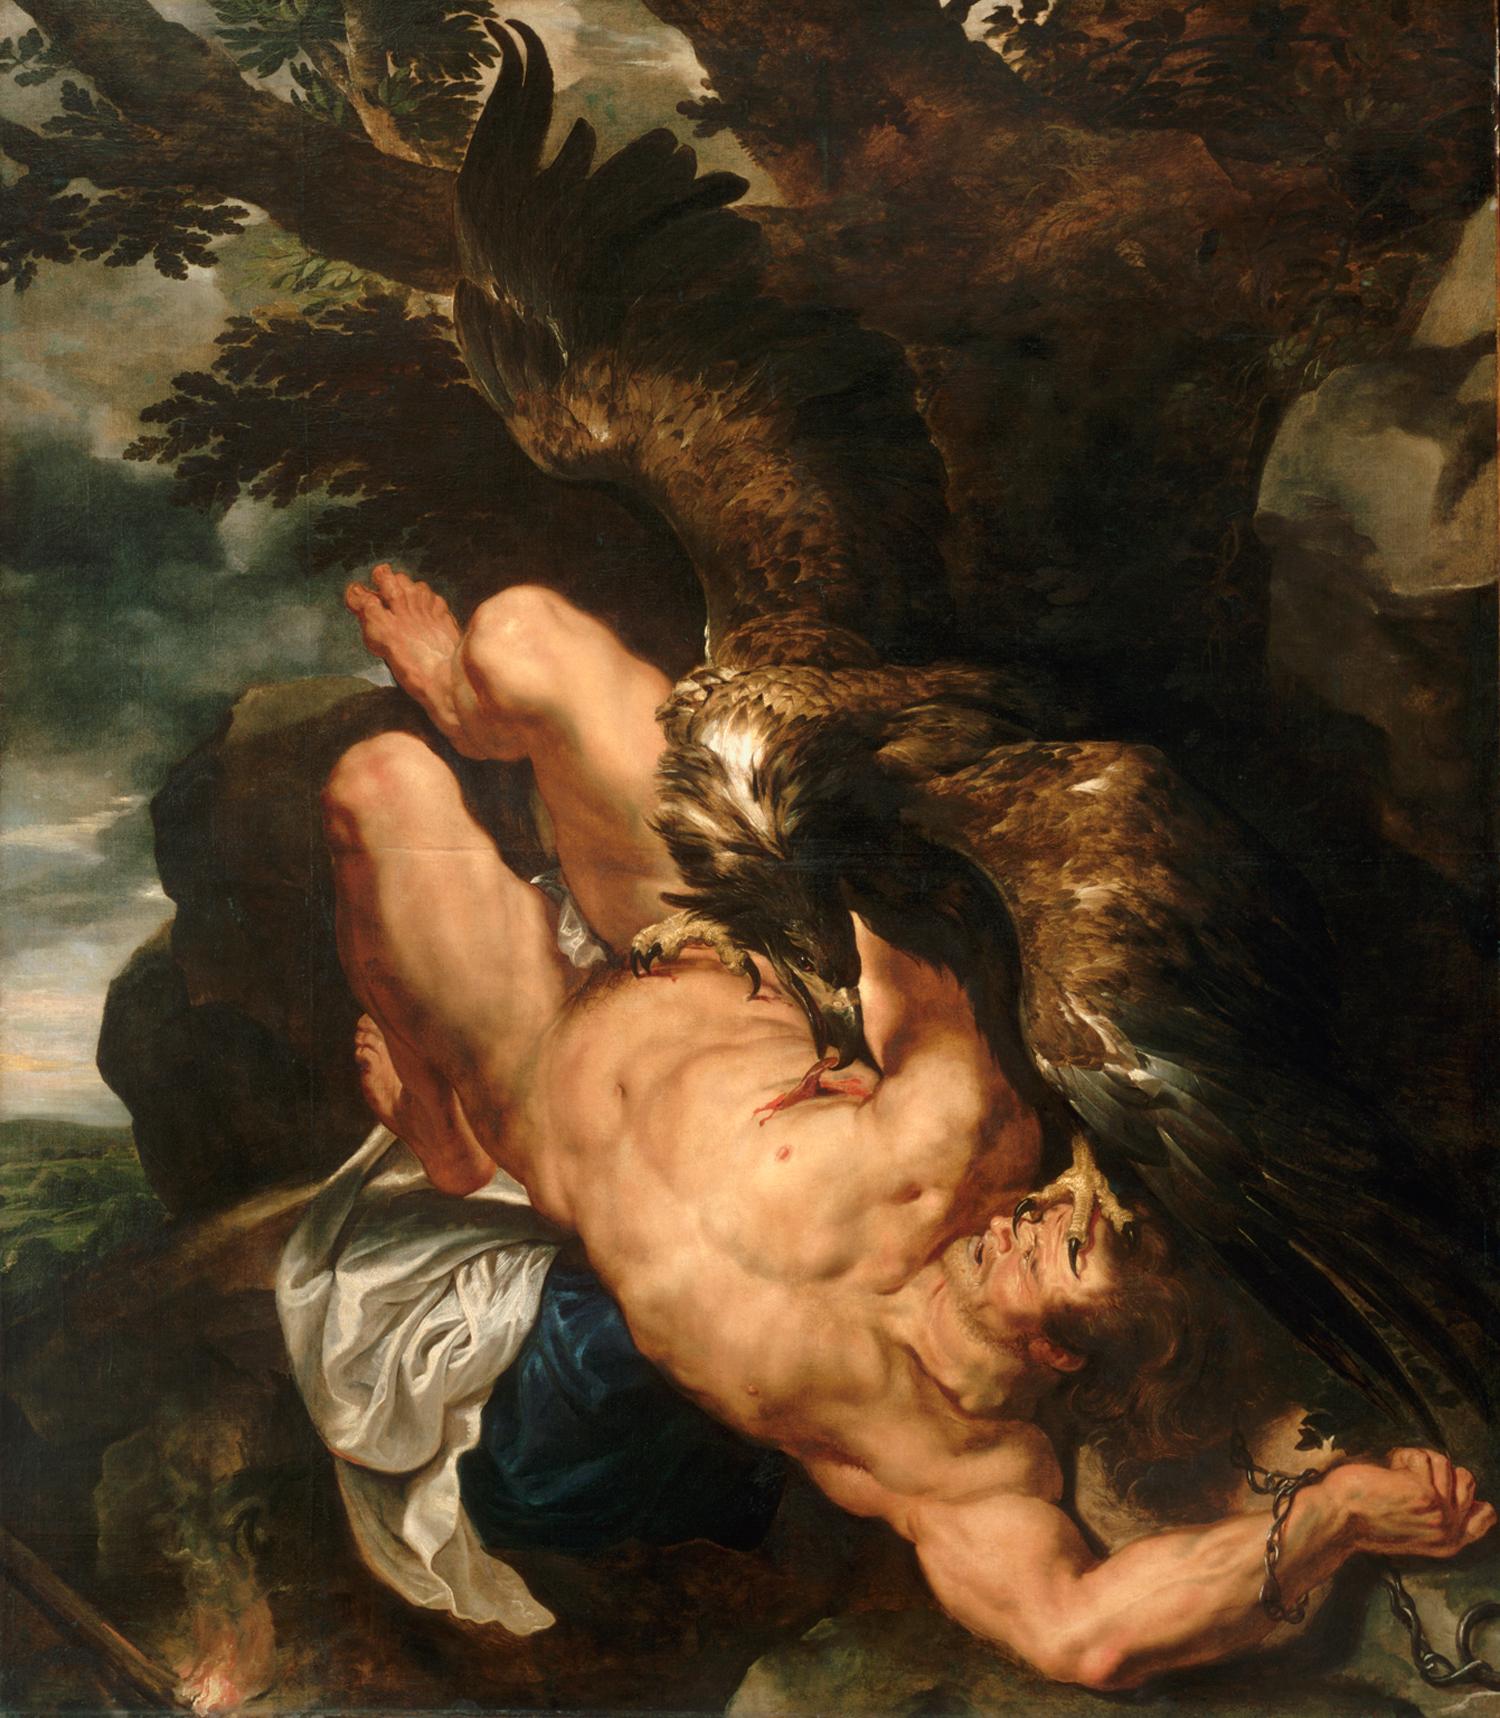 Prometheus-Bound-by-Peter-Paul-Rubens-c.-1618